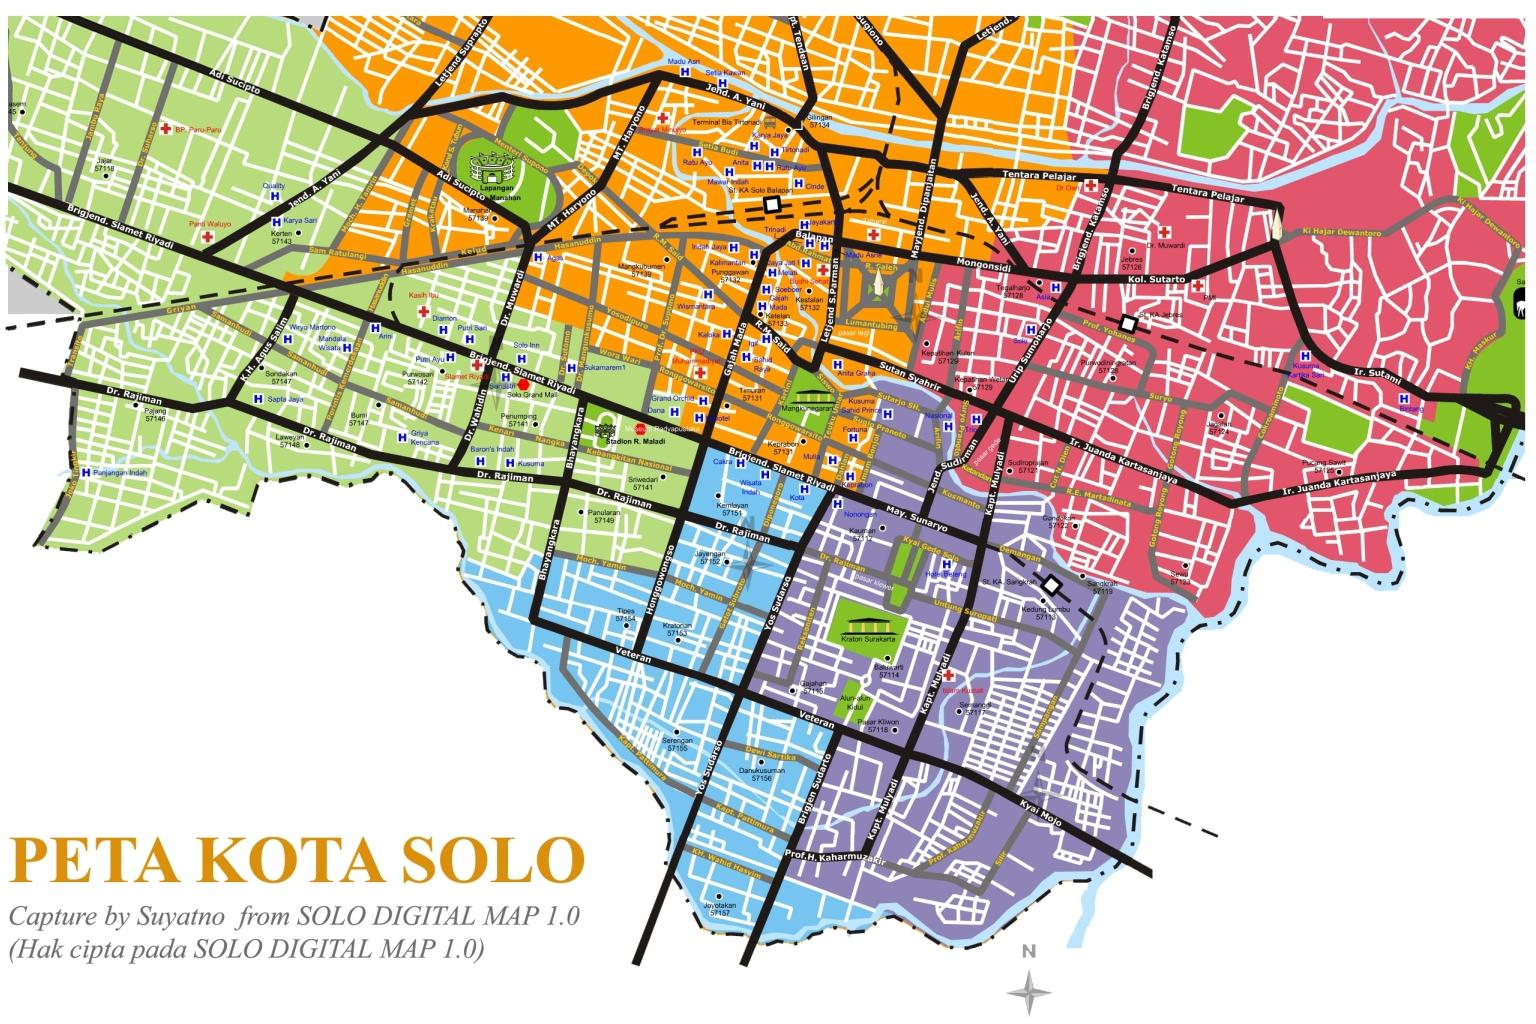 Panduan Wisata Kota Solo oleh Dimas Suyatno - Kompasiana.com